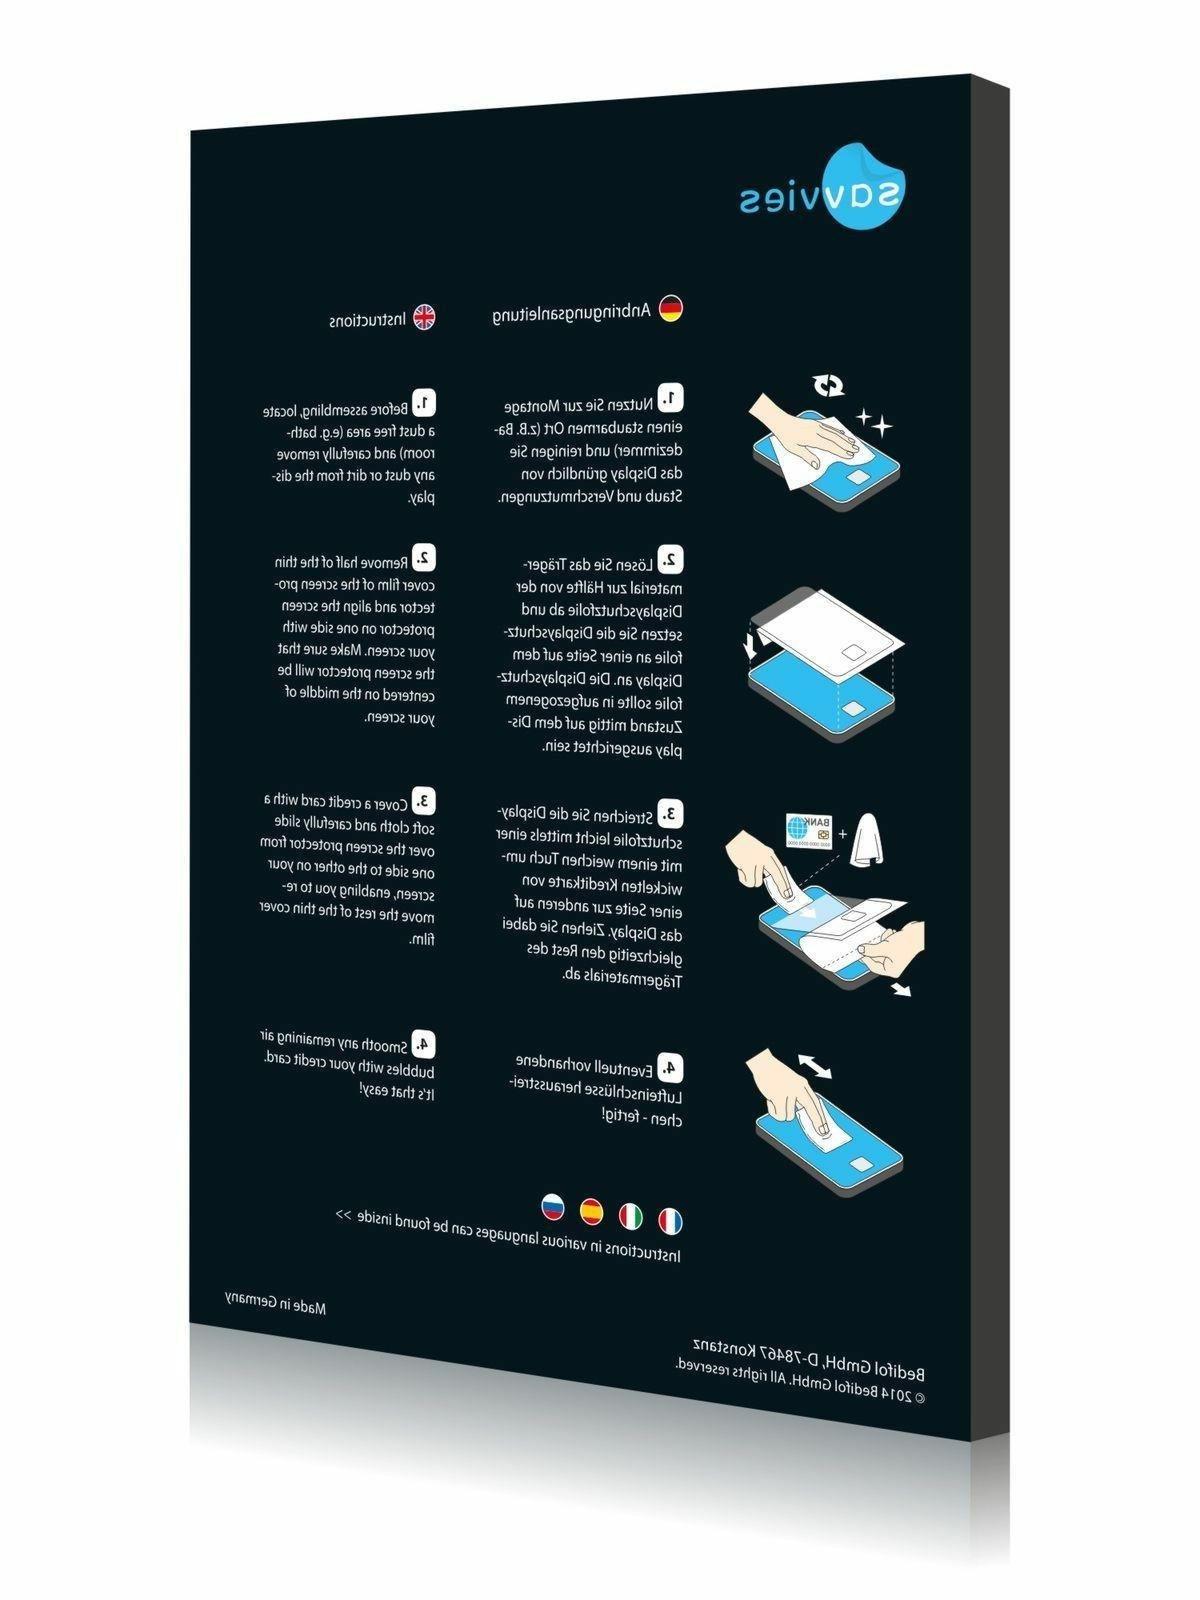 Garmin Hand Held, 6x ULTRA Screen